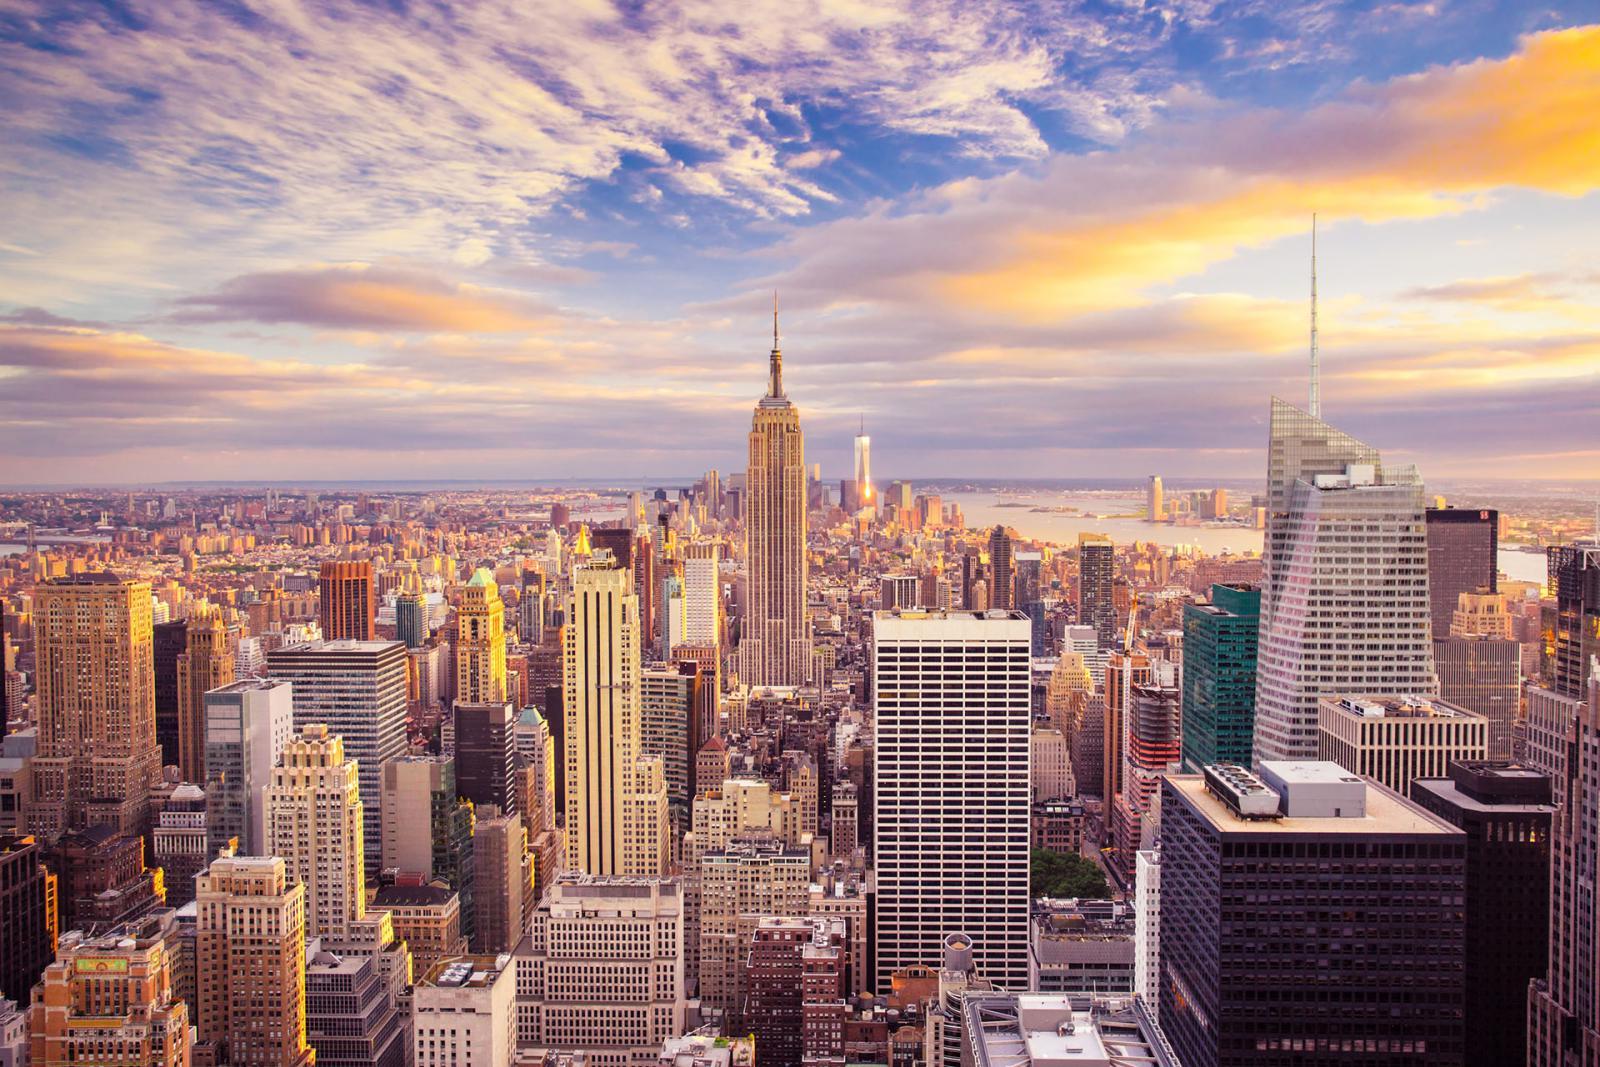 USA Direktflüge (New York, San Francisco) - Nonstop ab 268€ Hin und Rückflug von Frankfurt (Dez - Jun)